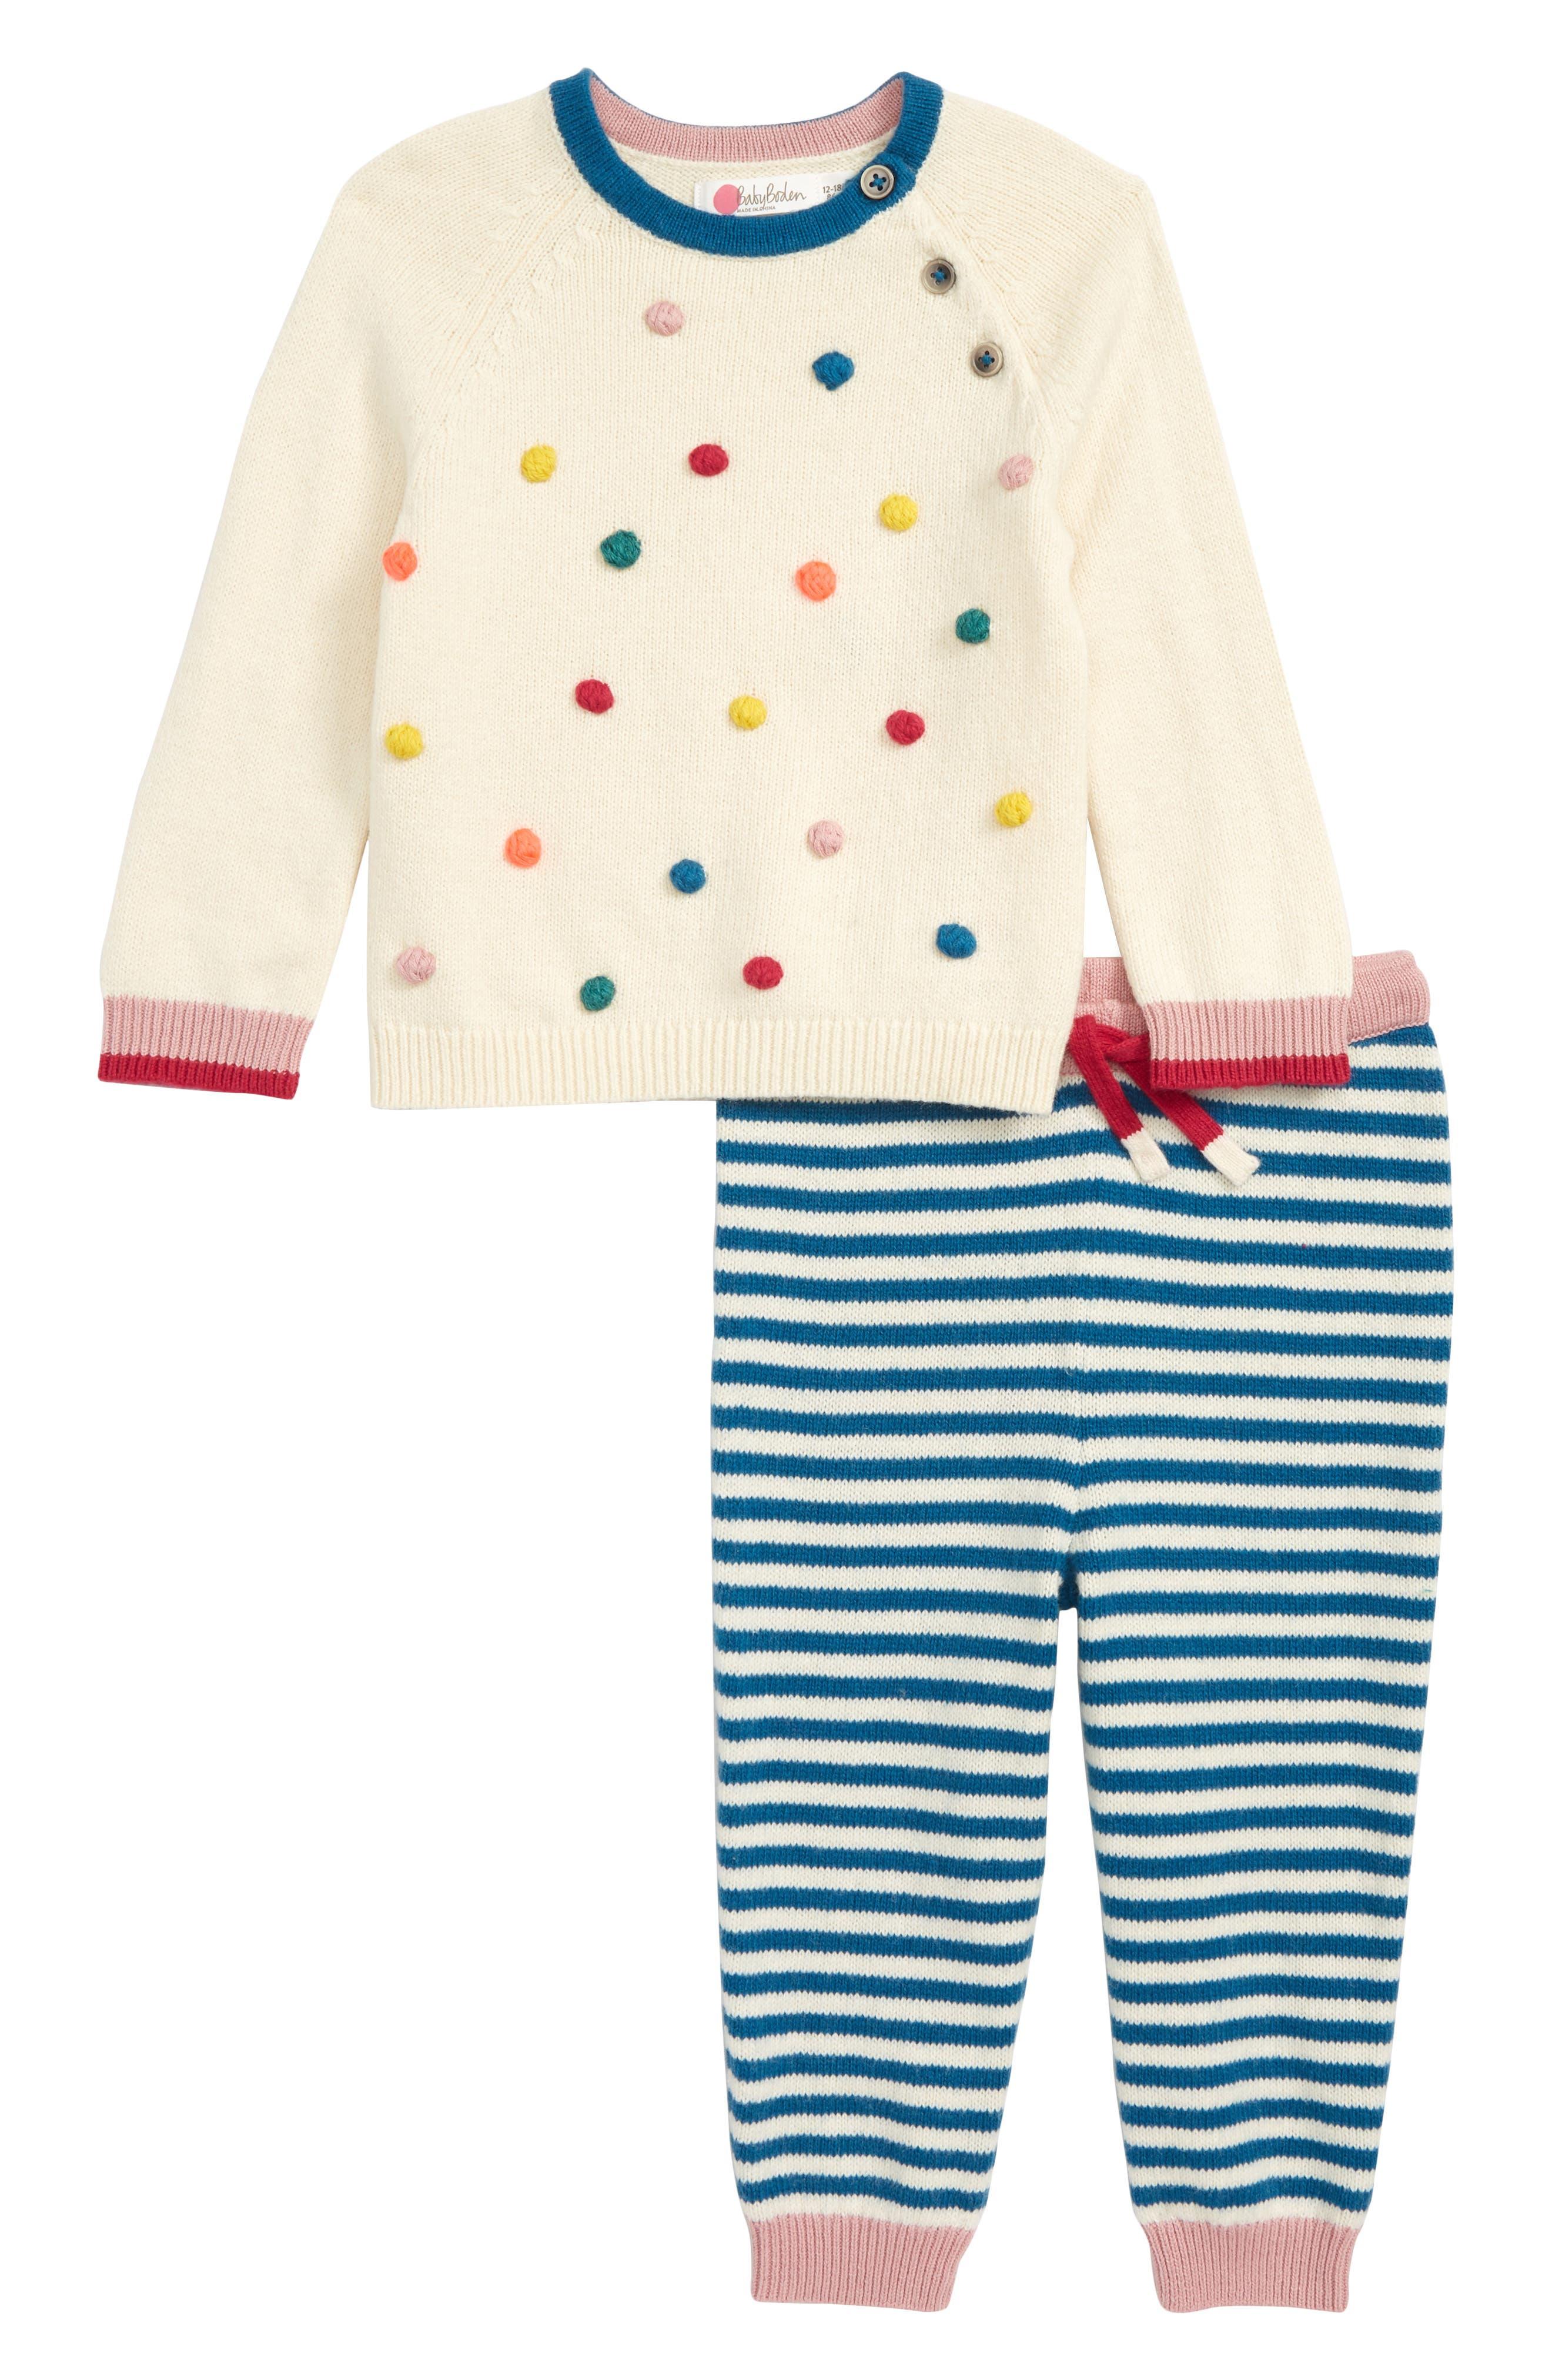 Pompom Knit Sweater & Pants Set, Main, color, 100